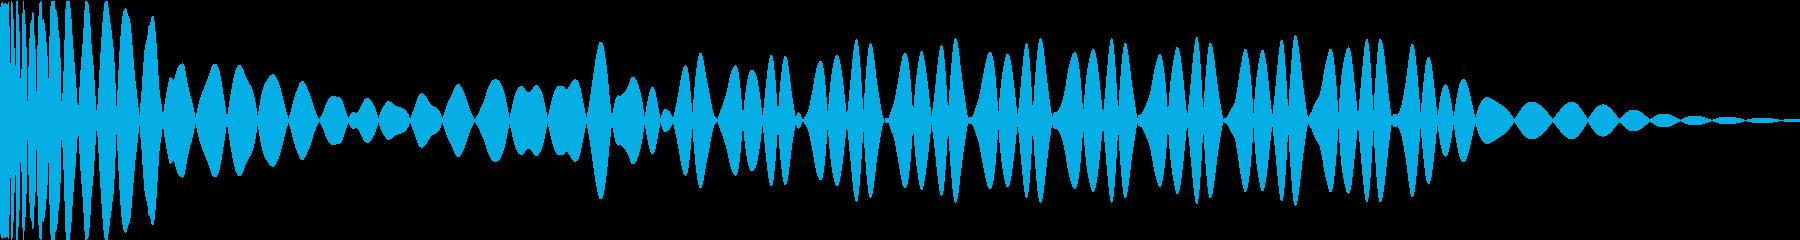 EDMキック キーDの再生済みの波形